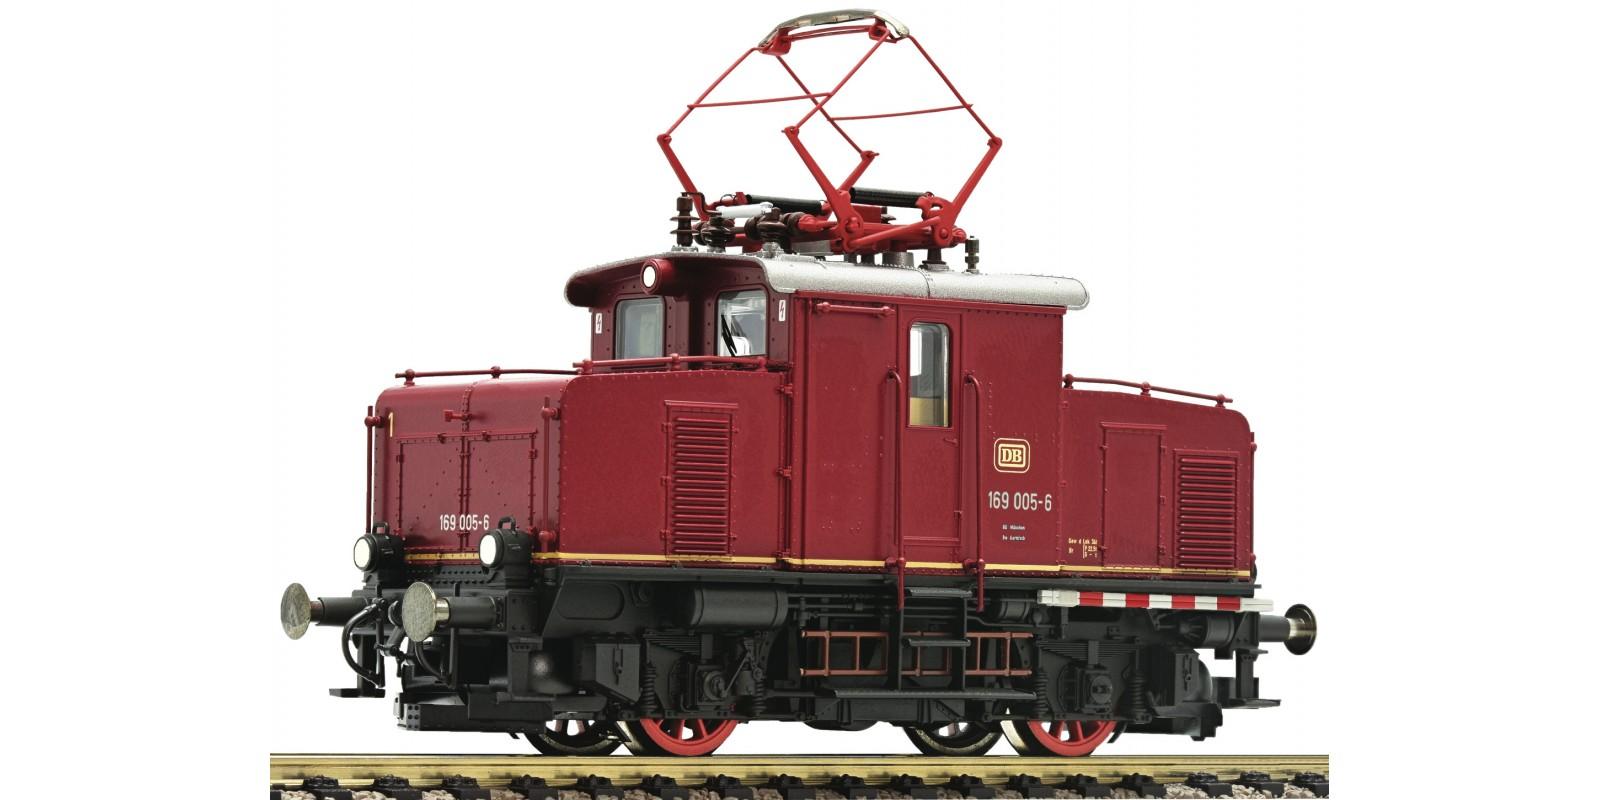 FL430005  - Electric locomotive 169 05-6, DB, DC, analog